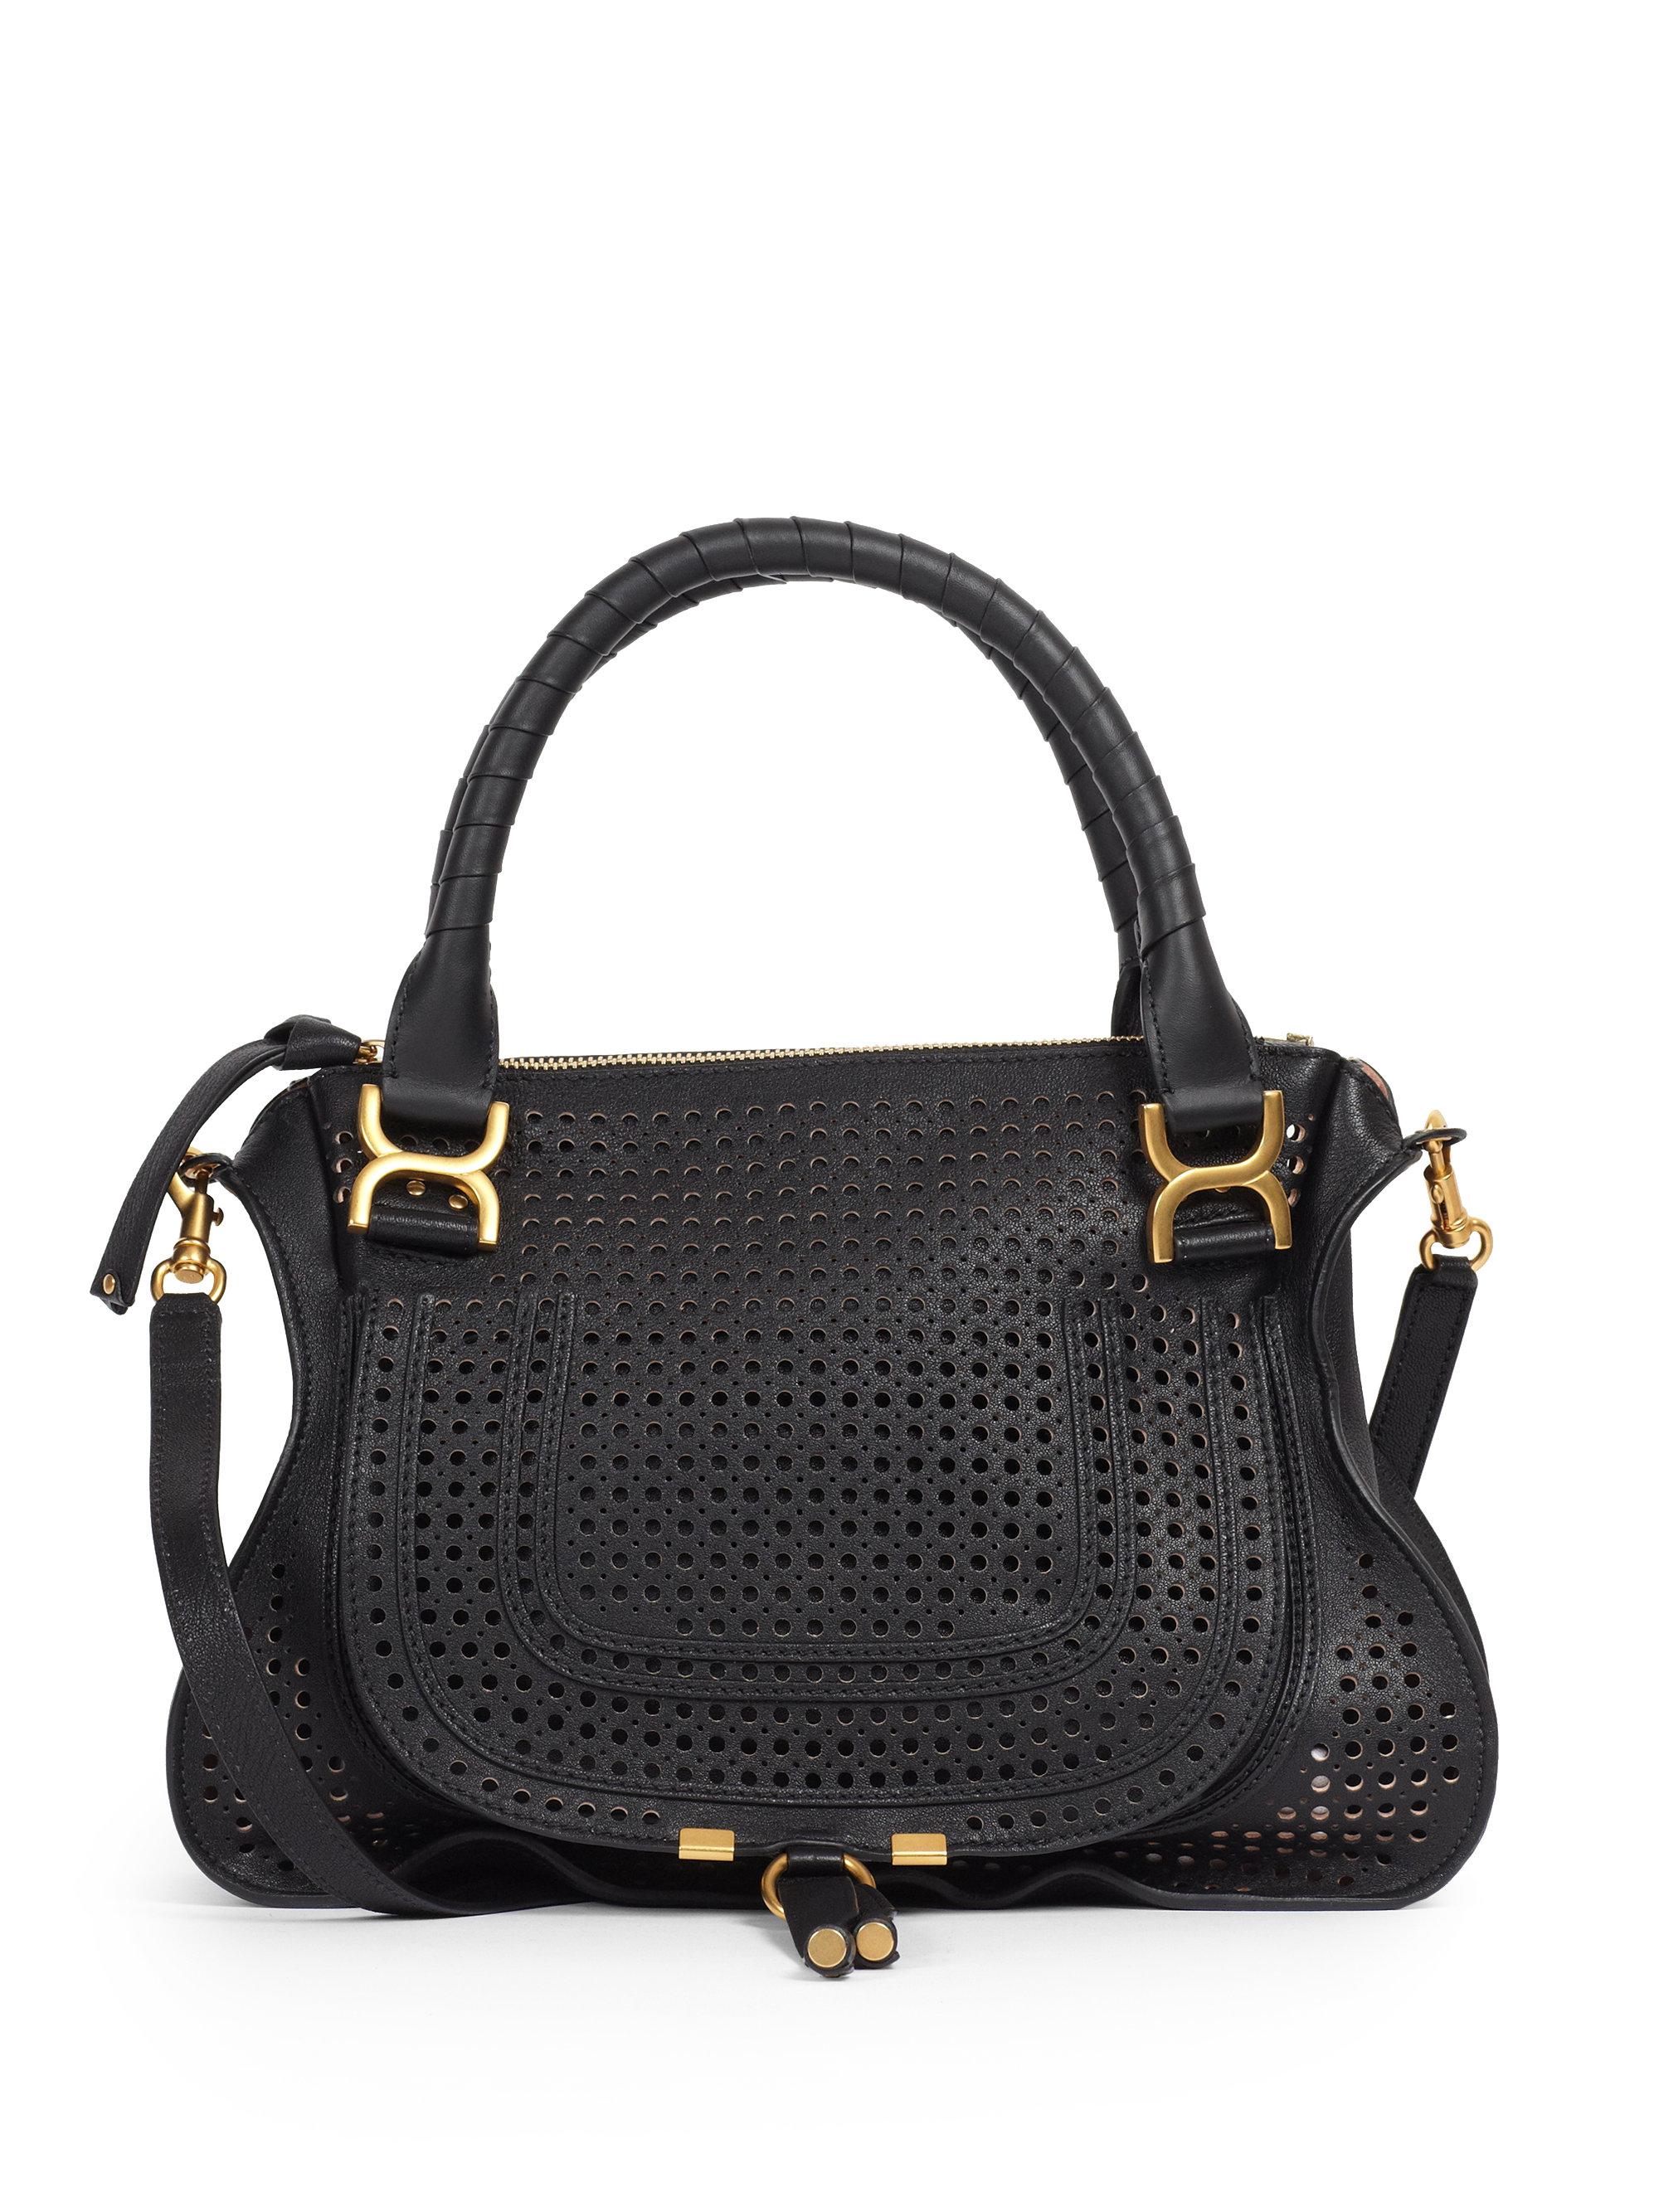 chlo marcie medium perforated satchel in black lyst. Black Bedroom Furniture Sets. Home Design Ideas